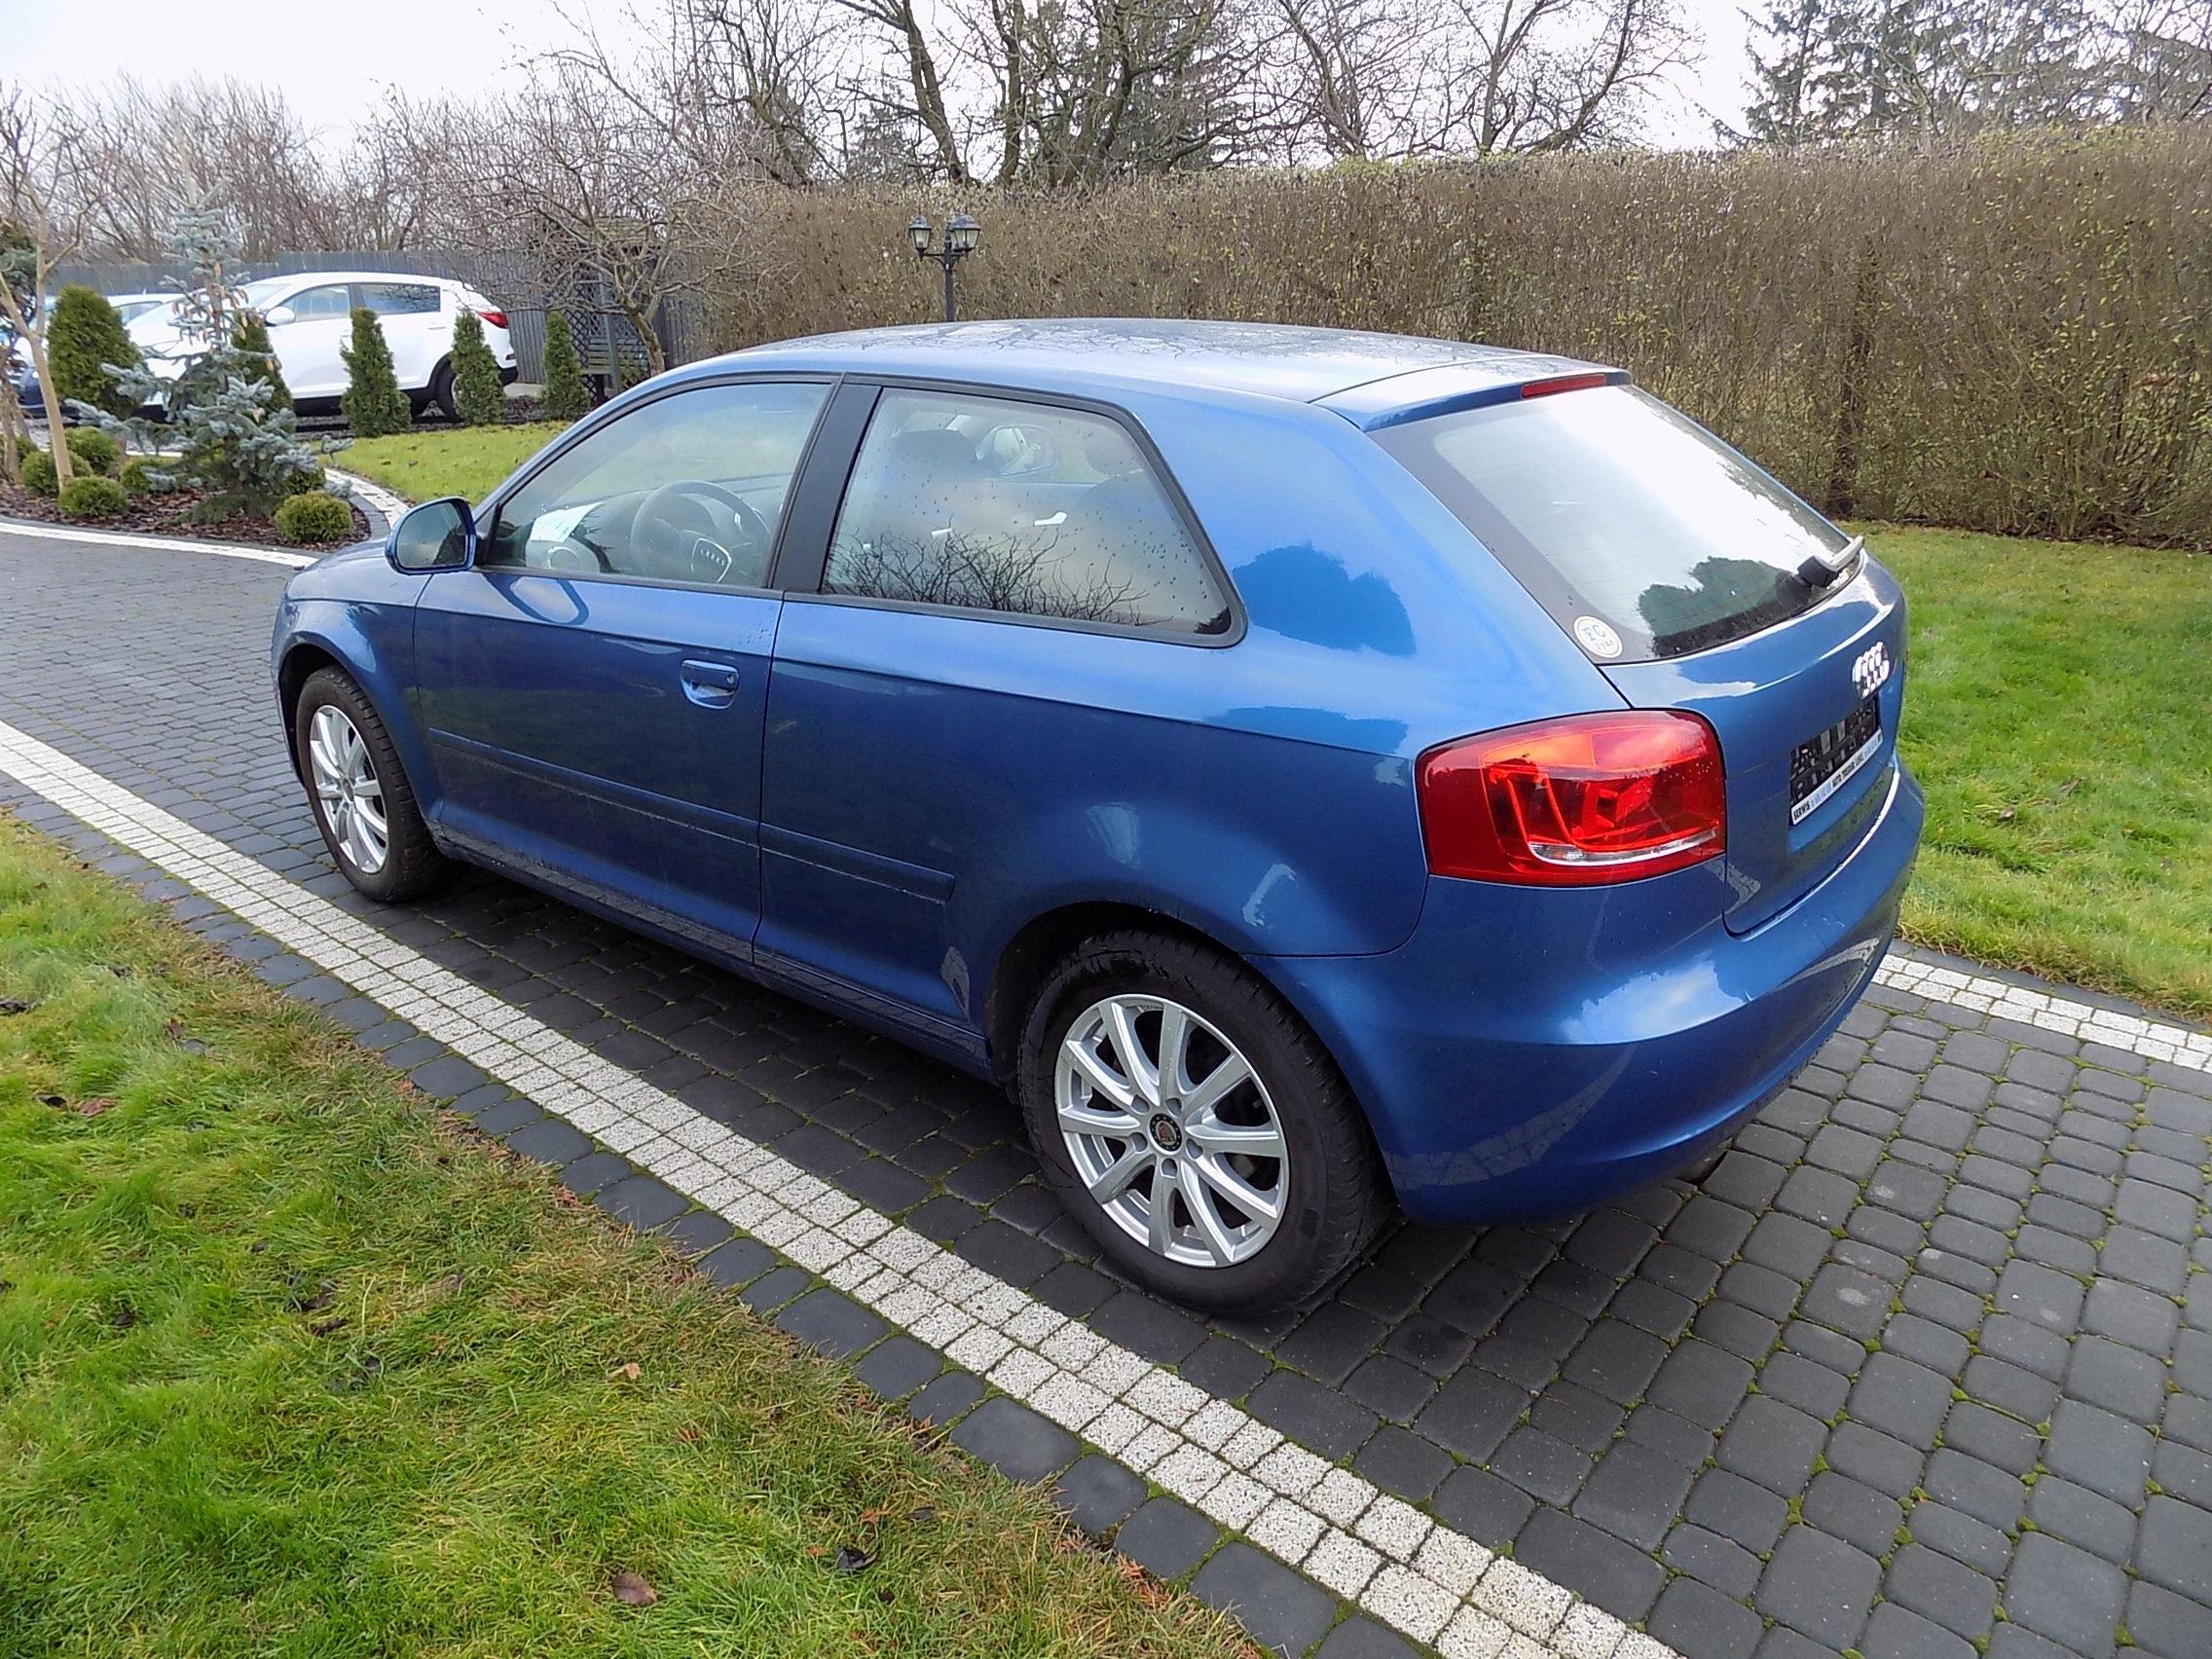 Audi A3 1 6 Mpi 102 Km Opinie I Ceny Na Ceneo Pl